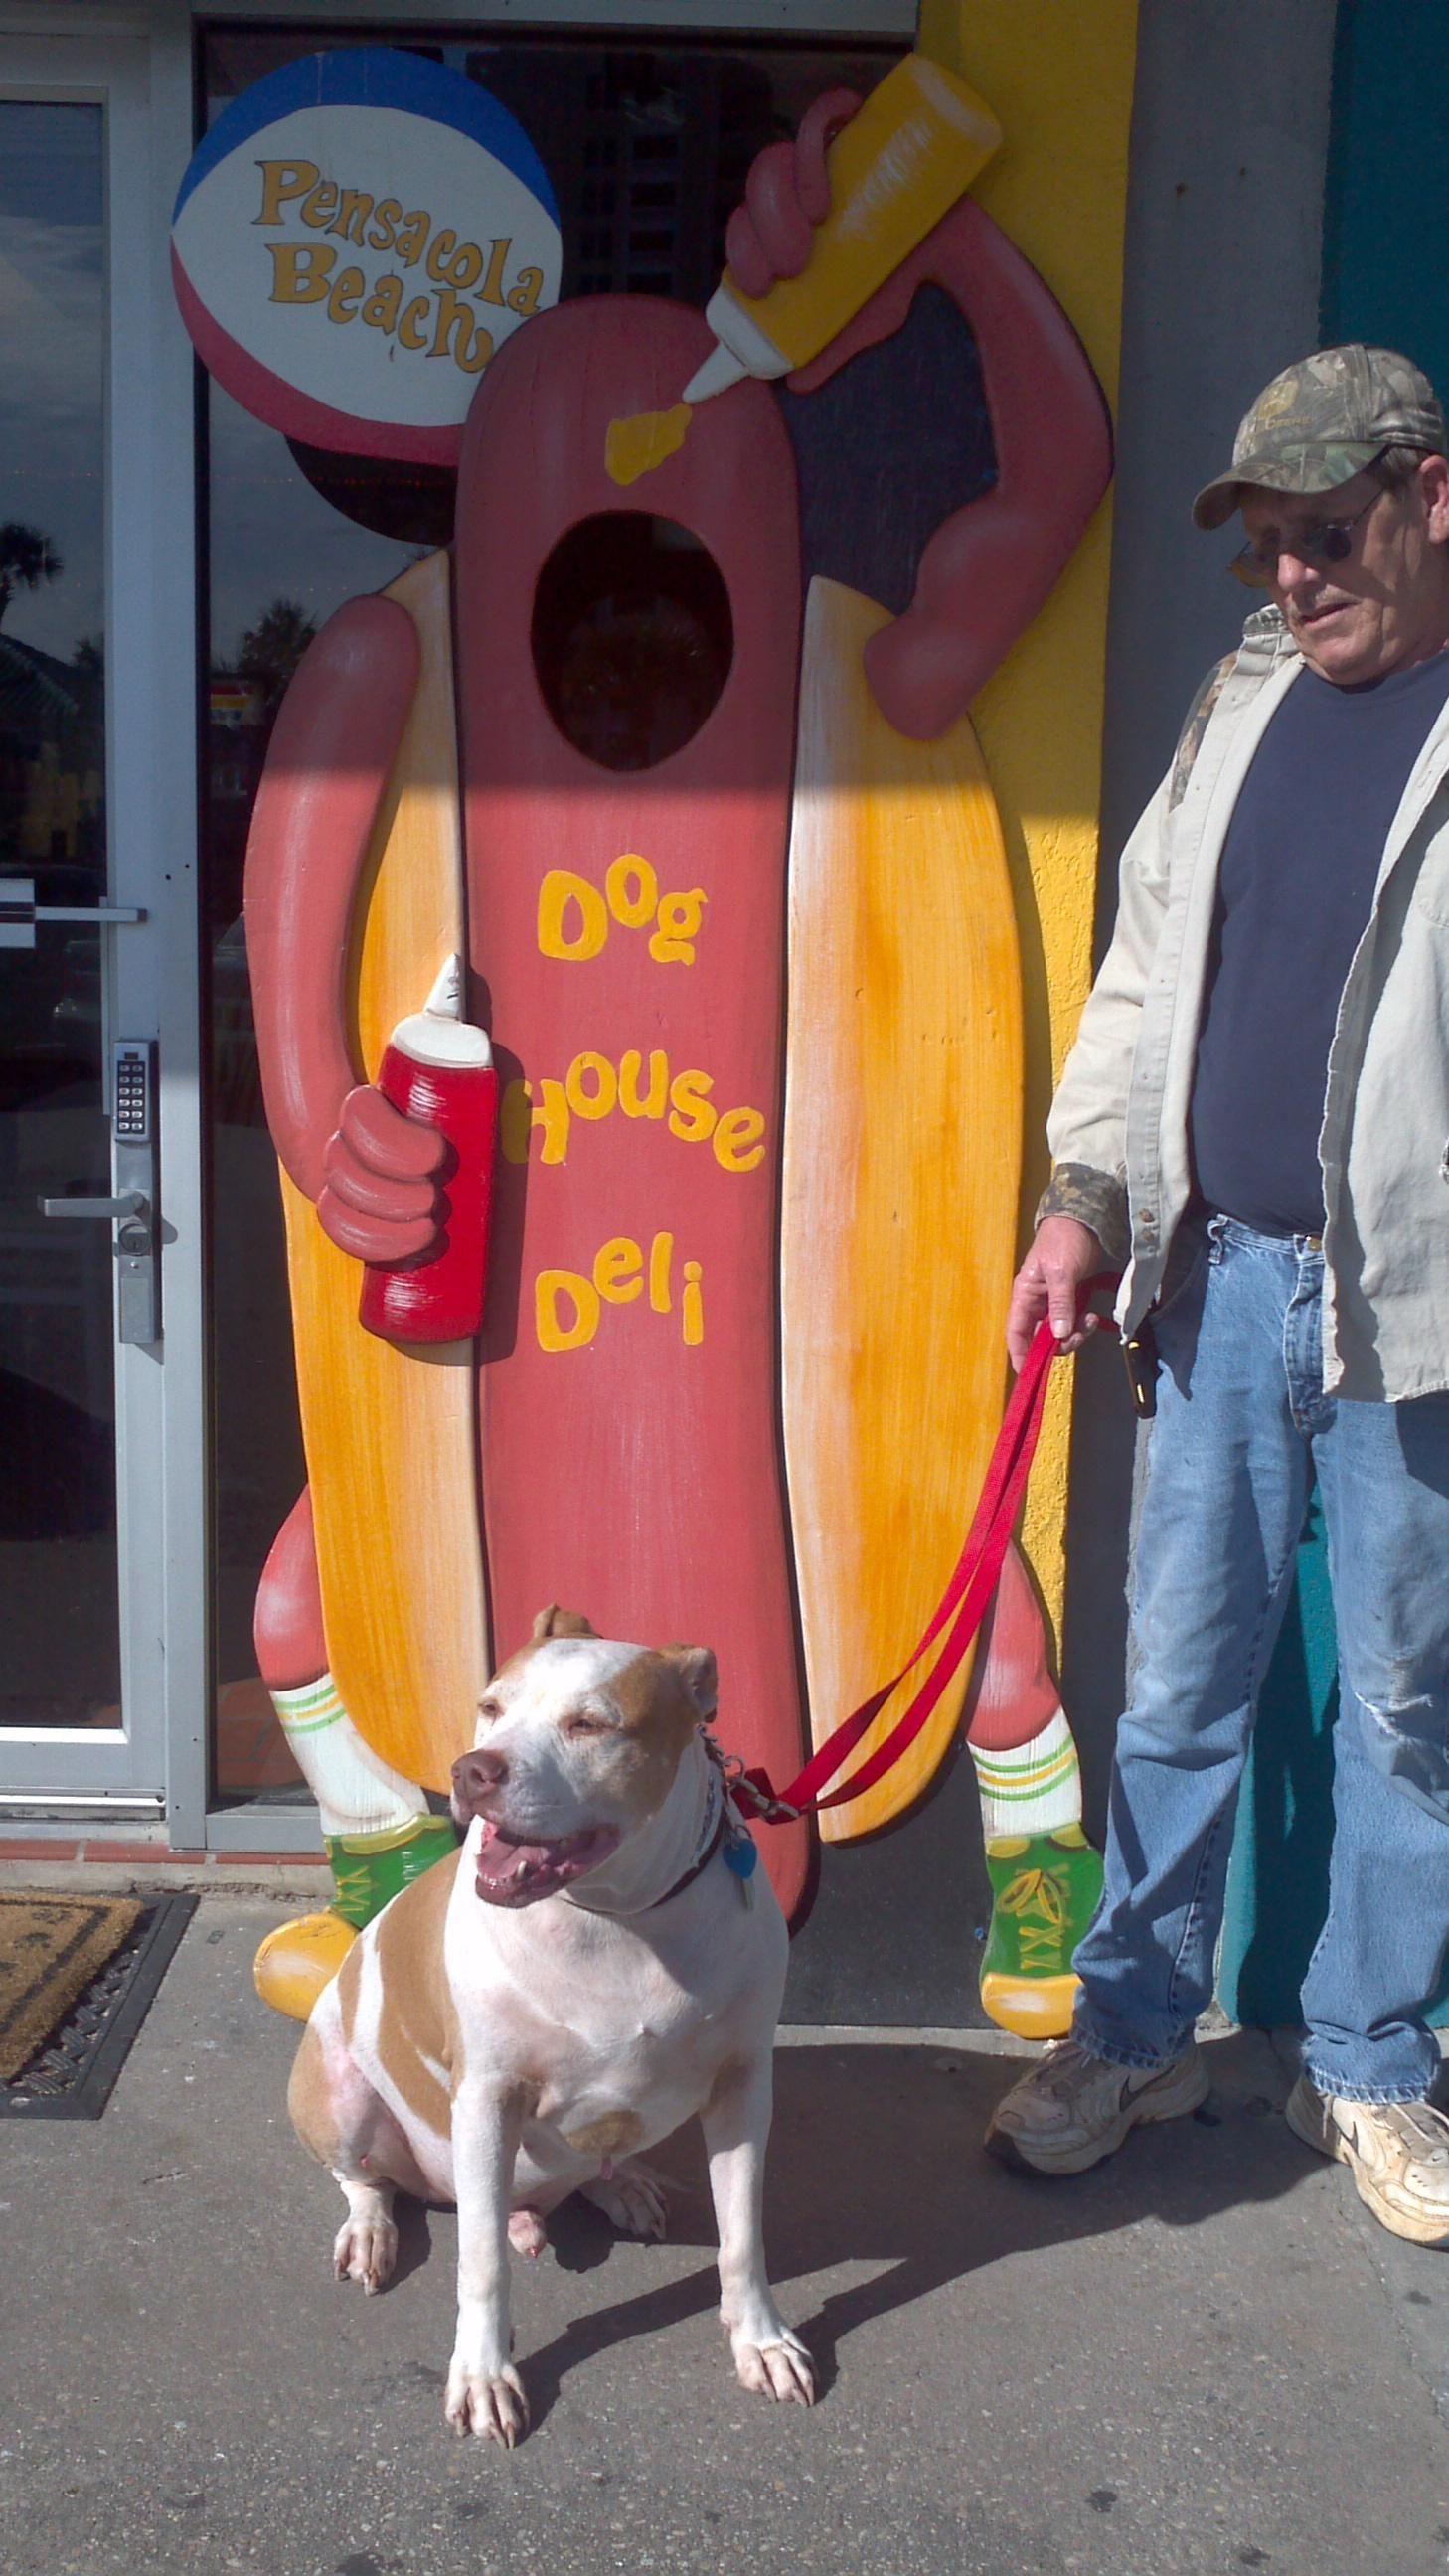 Dog House Deli Pensacola Beach Trip Advisor Dogs